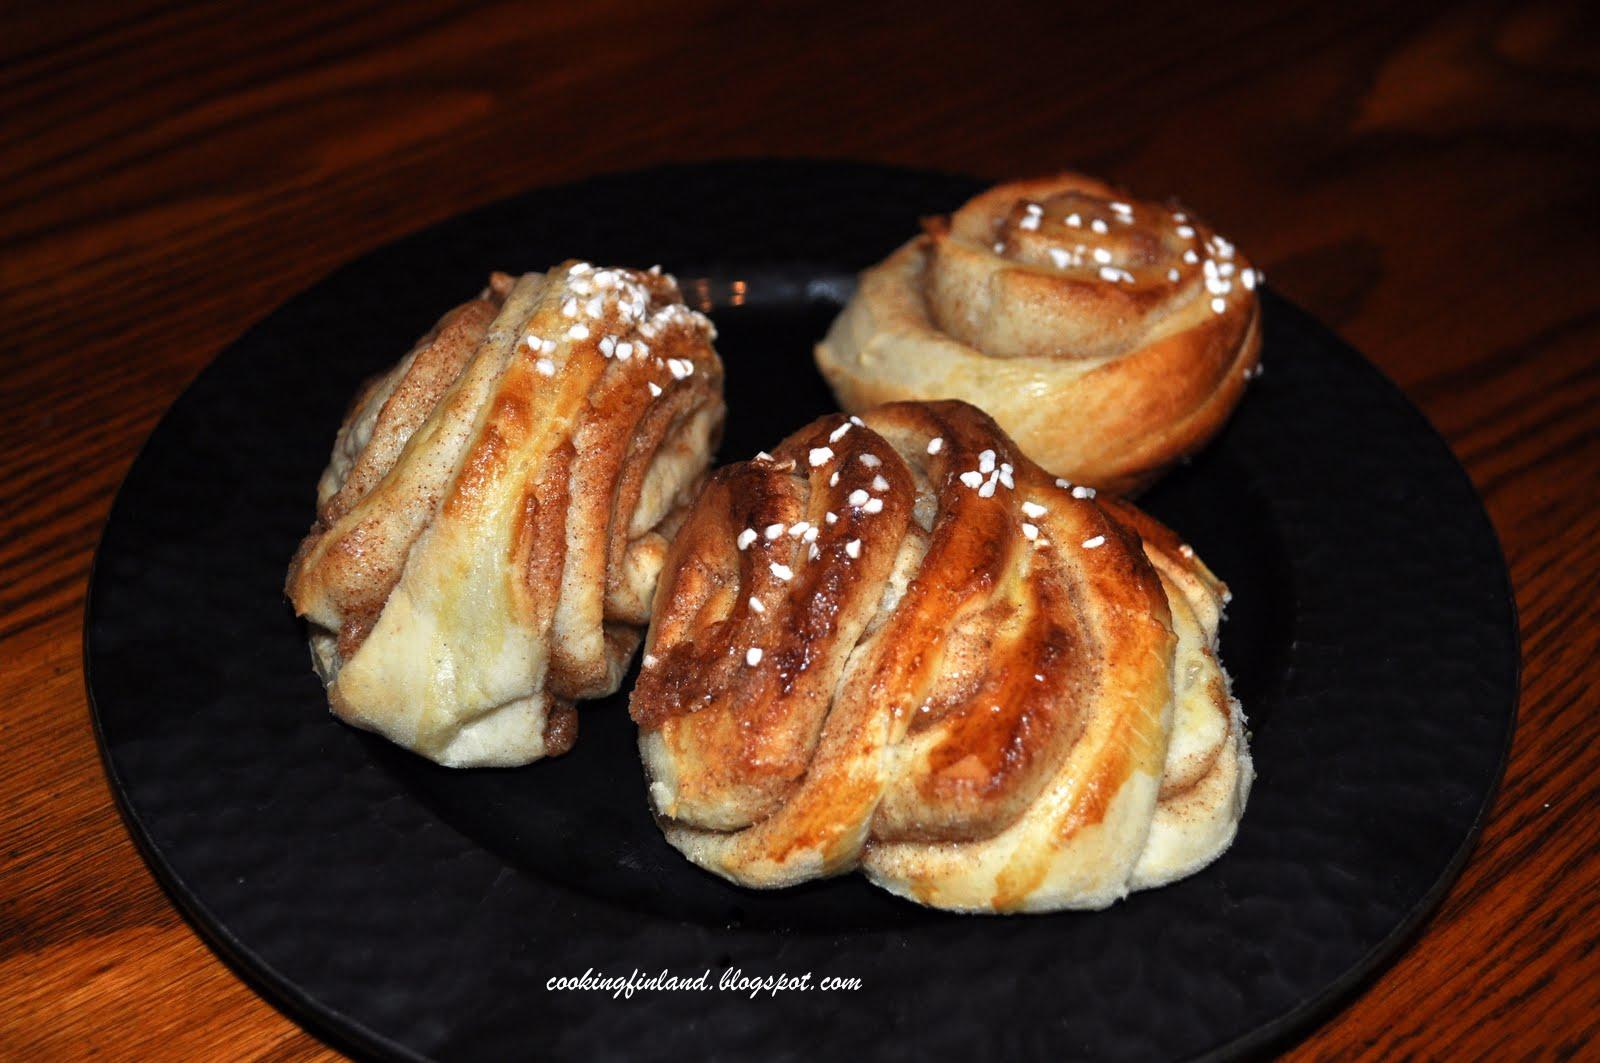 Cooking Finland: Cinnamon buns--Kaneli pulla (korvapuustit)